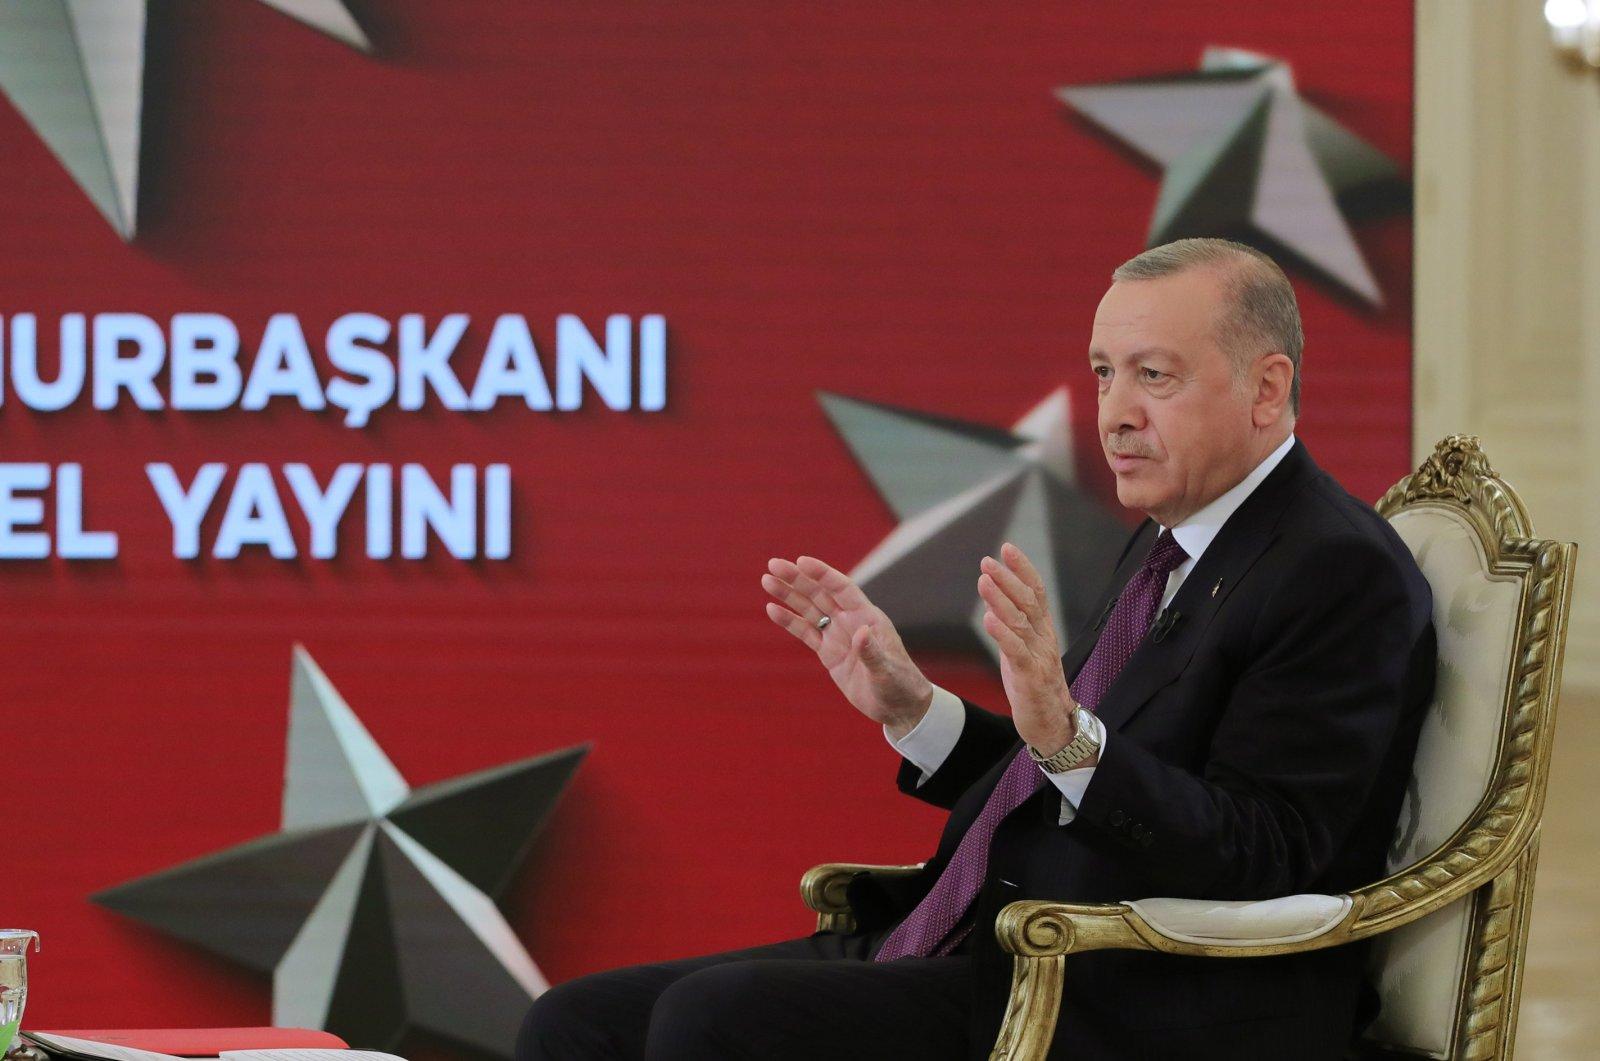 Turkish President Recep Tayyip Erdoğan reacts during an interview on TRT Haber at Çankaya Mansion, Ankara, Turkey, June 1, 2021. (AA Photo)